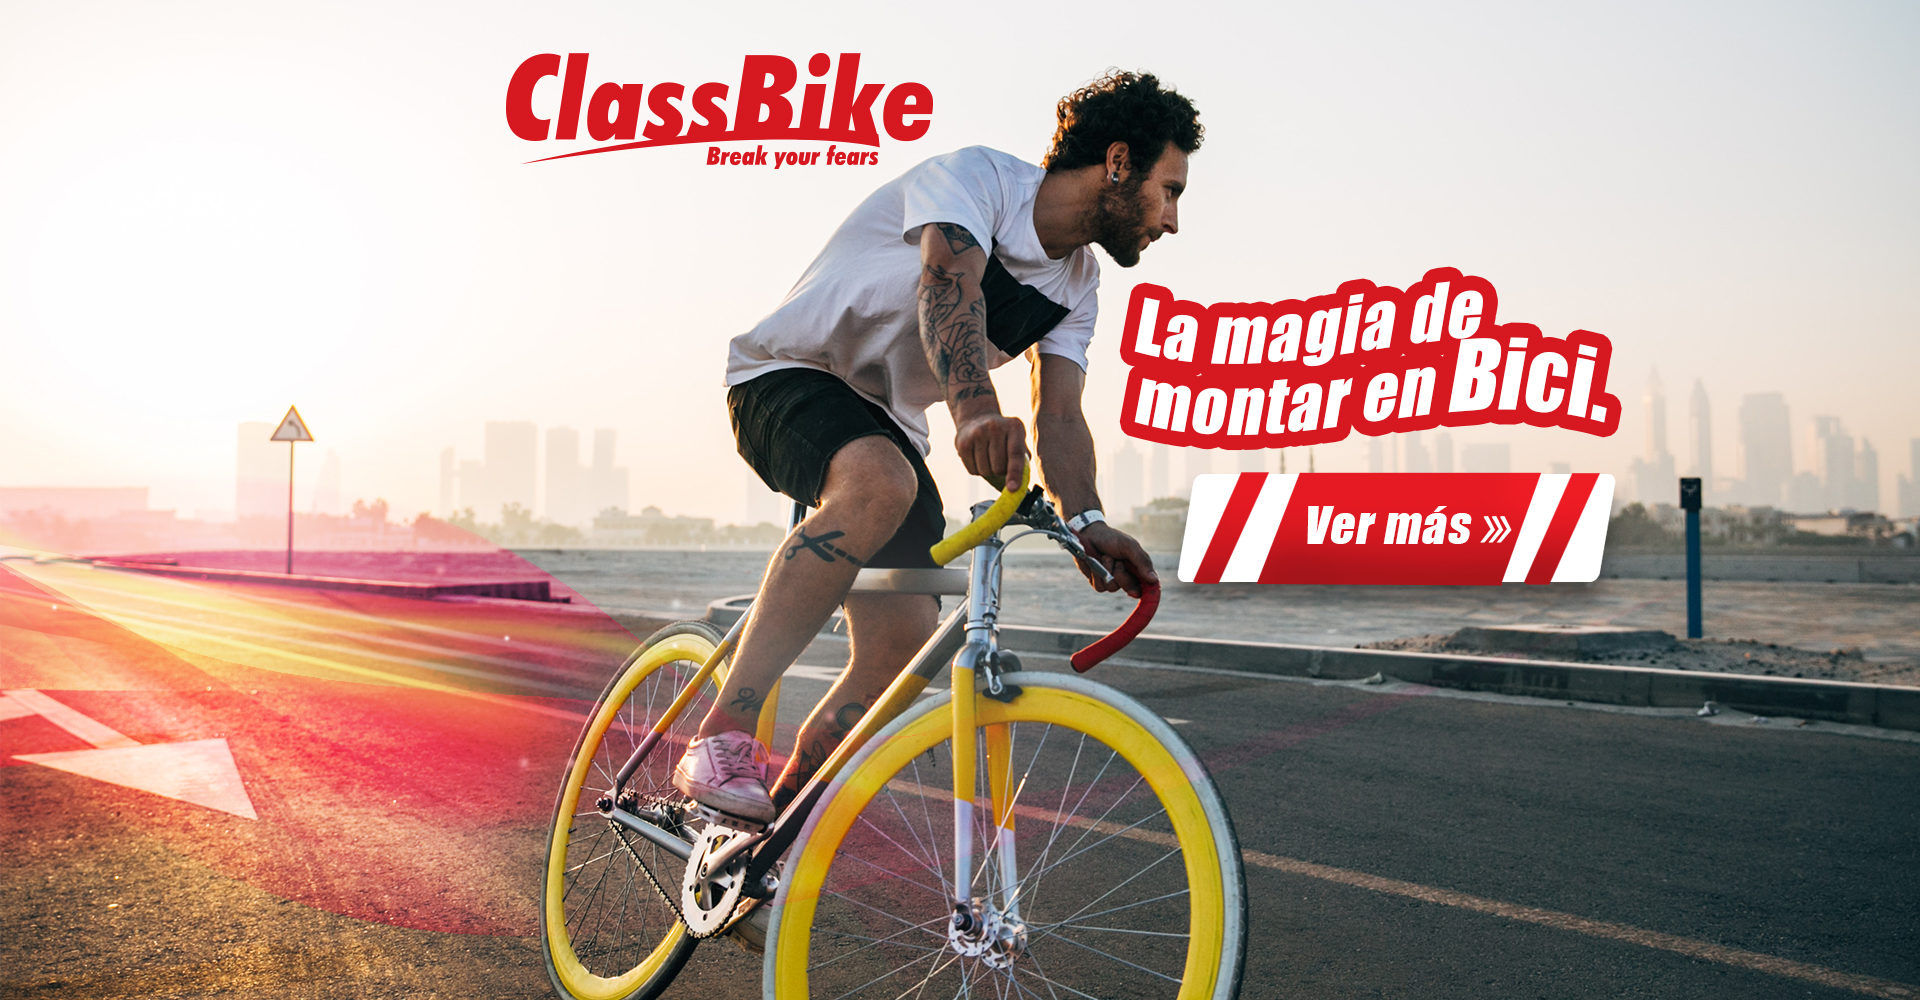 Ventas de bicicletas importadas en Bogotá. ClassBike, break your fears.